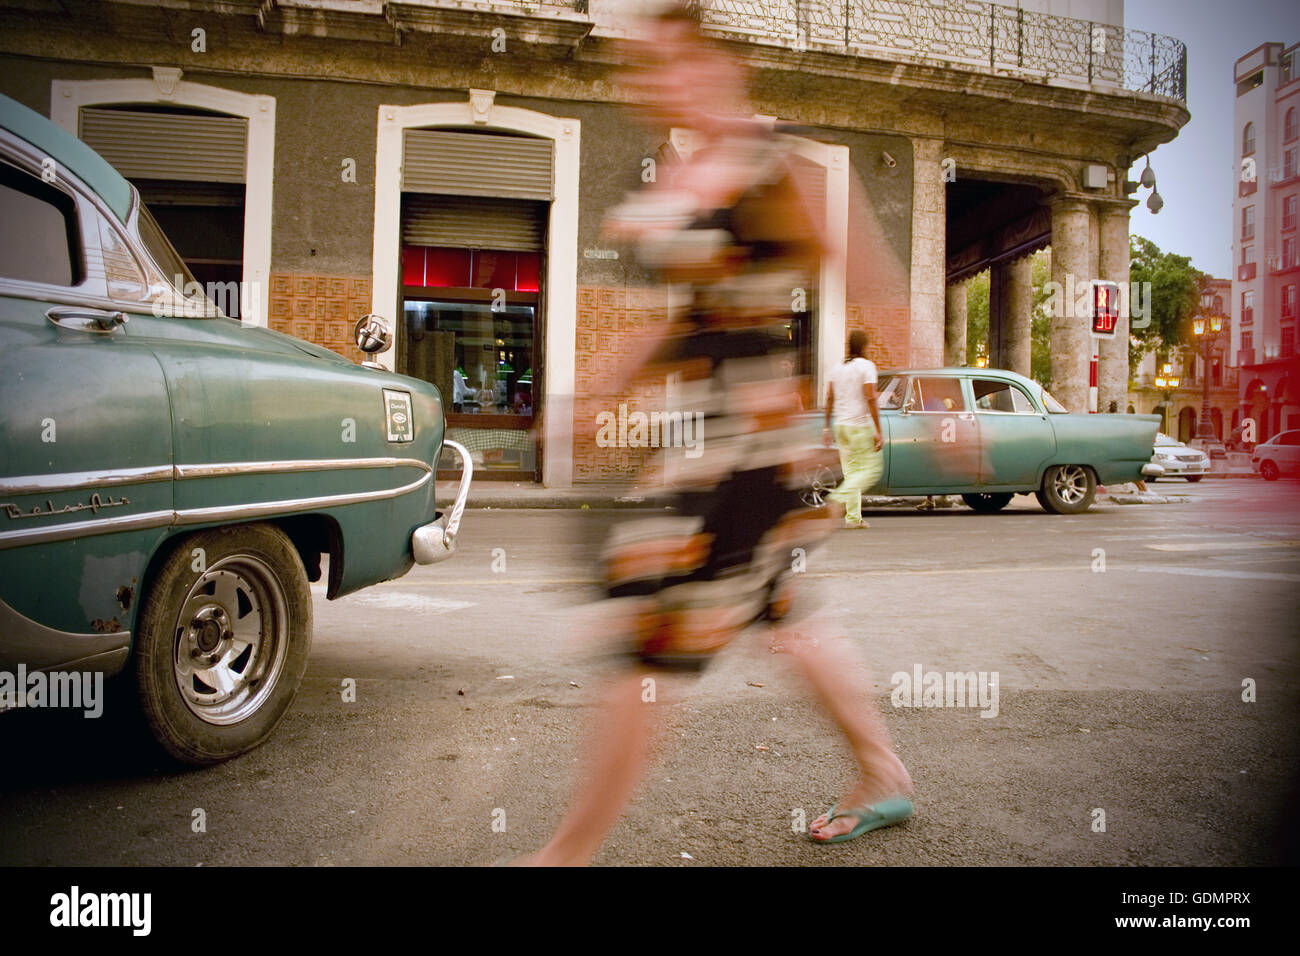 Slow motion blur of woman walking amongst classic old cars in downtown Havana, Cuba - Stock Image